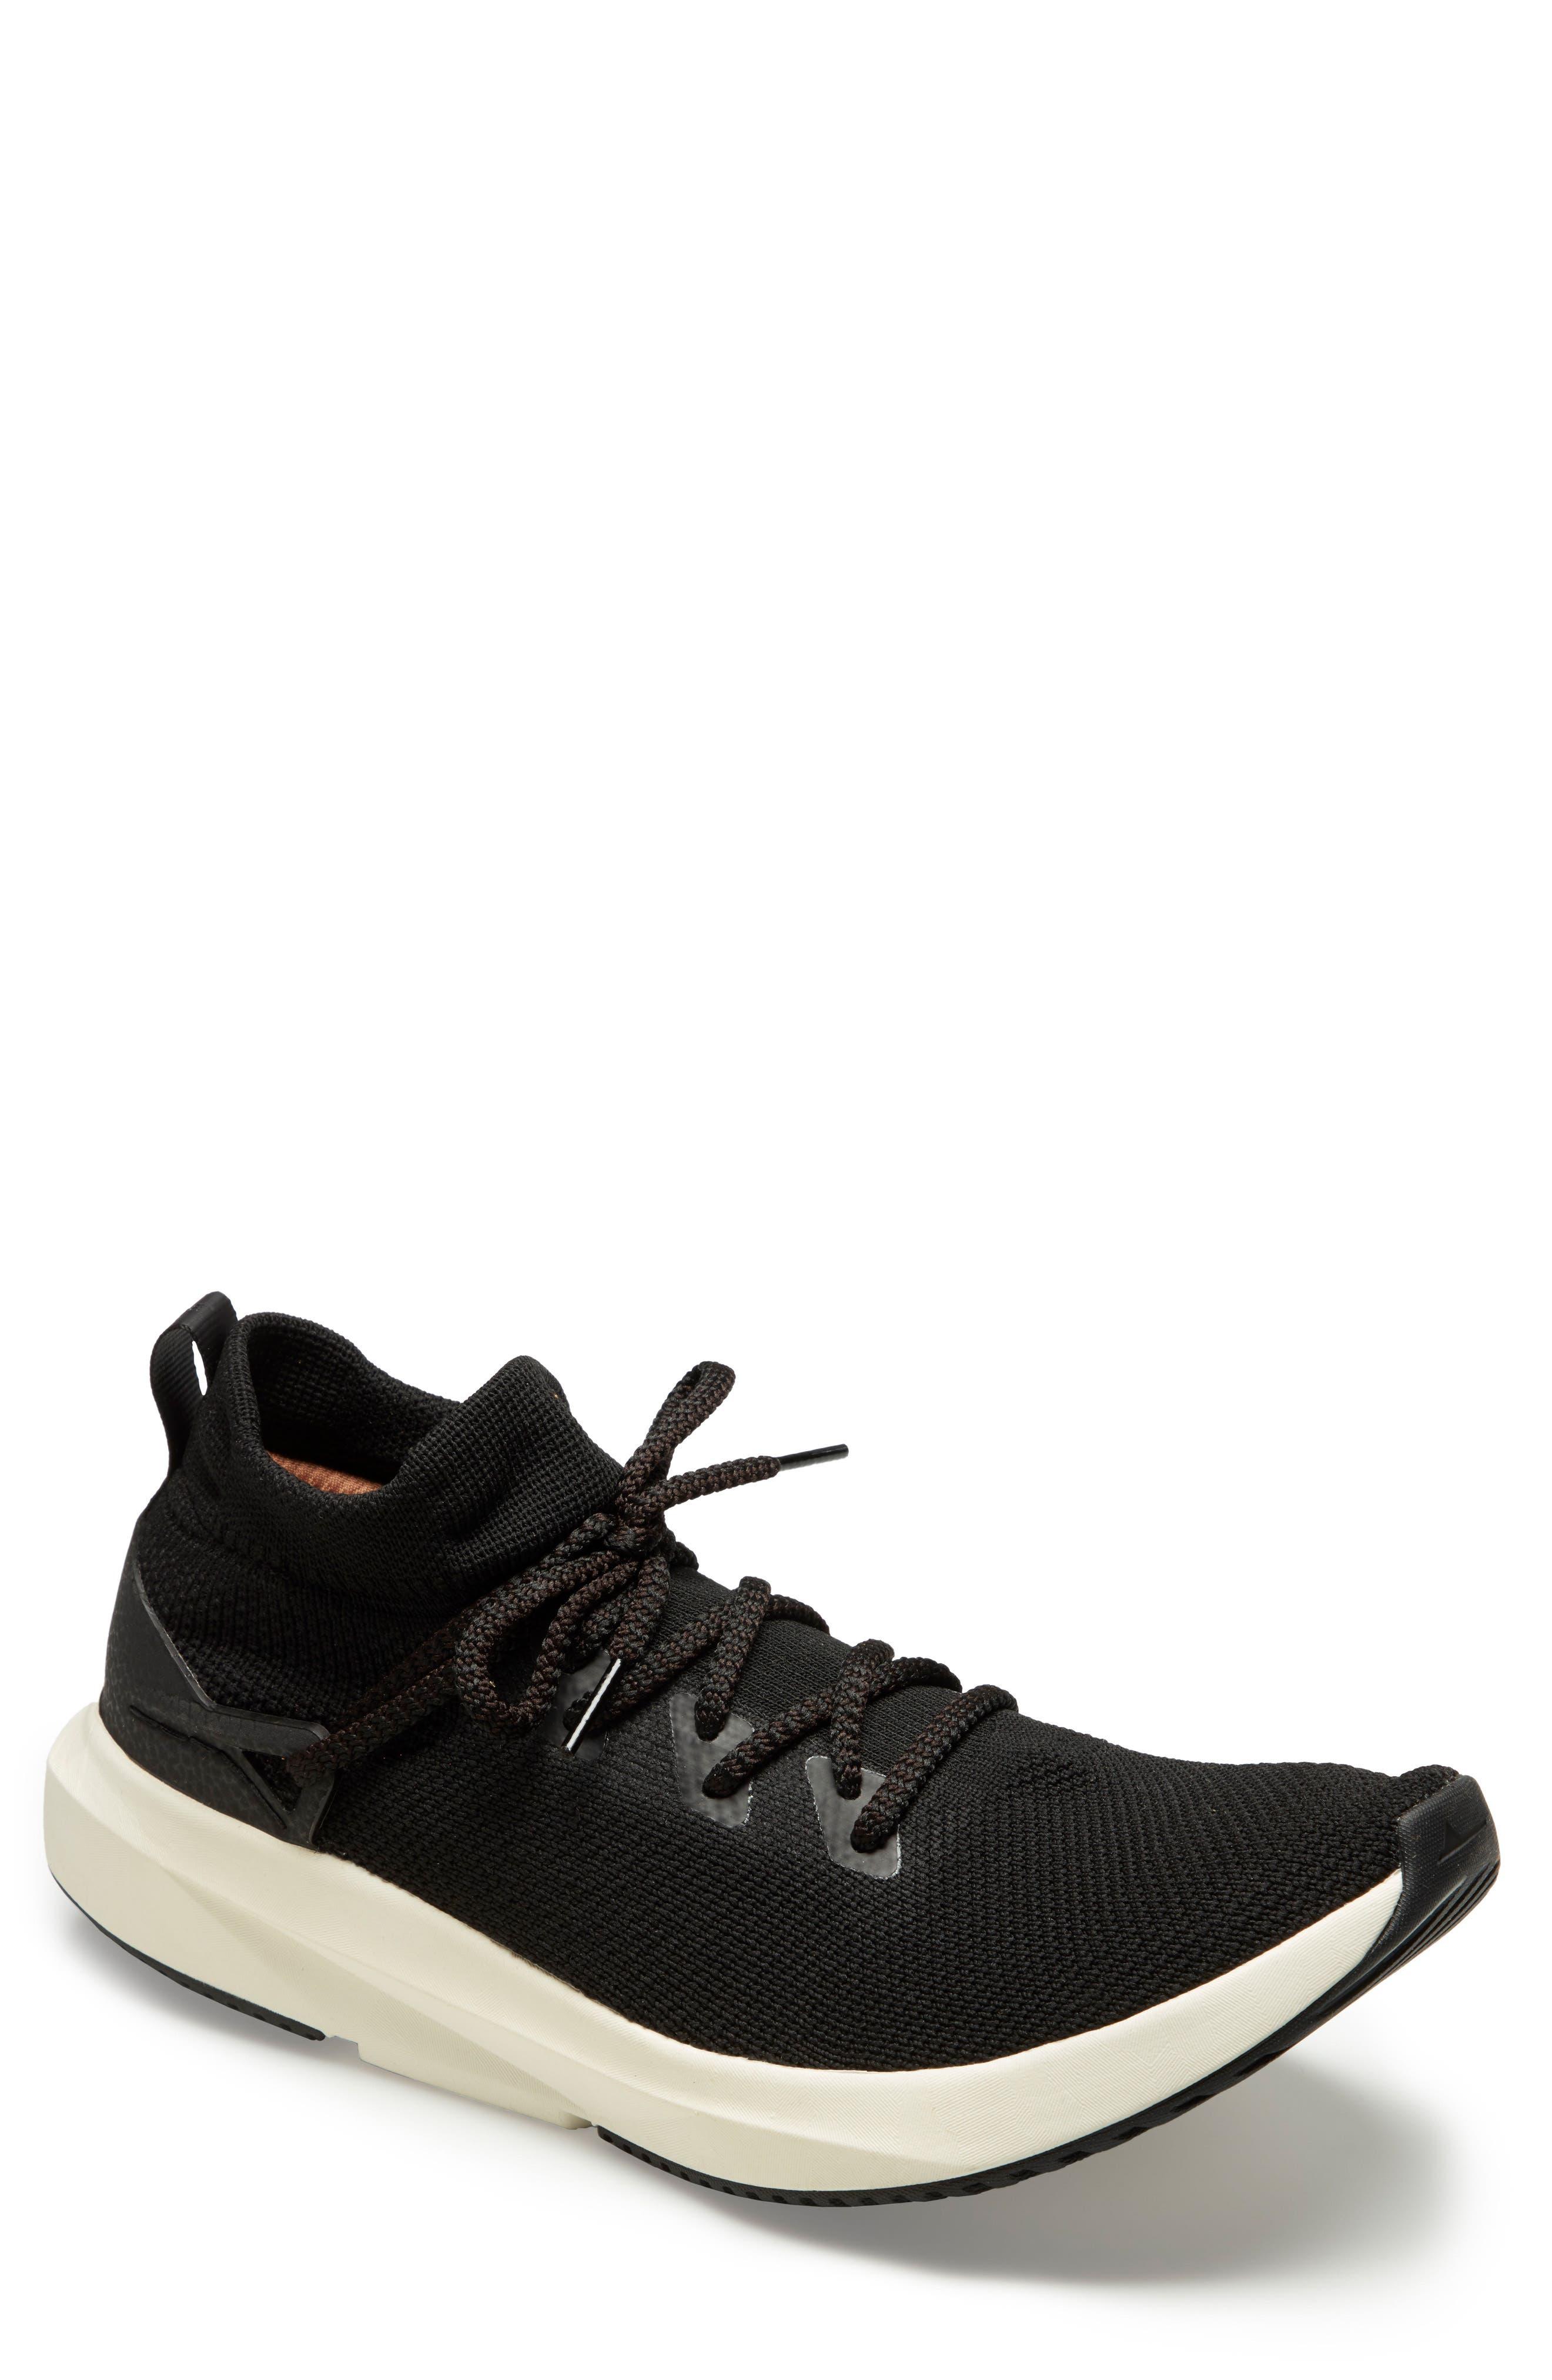 Kaze Sneaker,                             Main thumbnail 1, color,